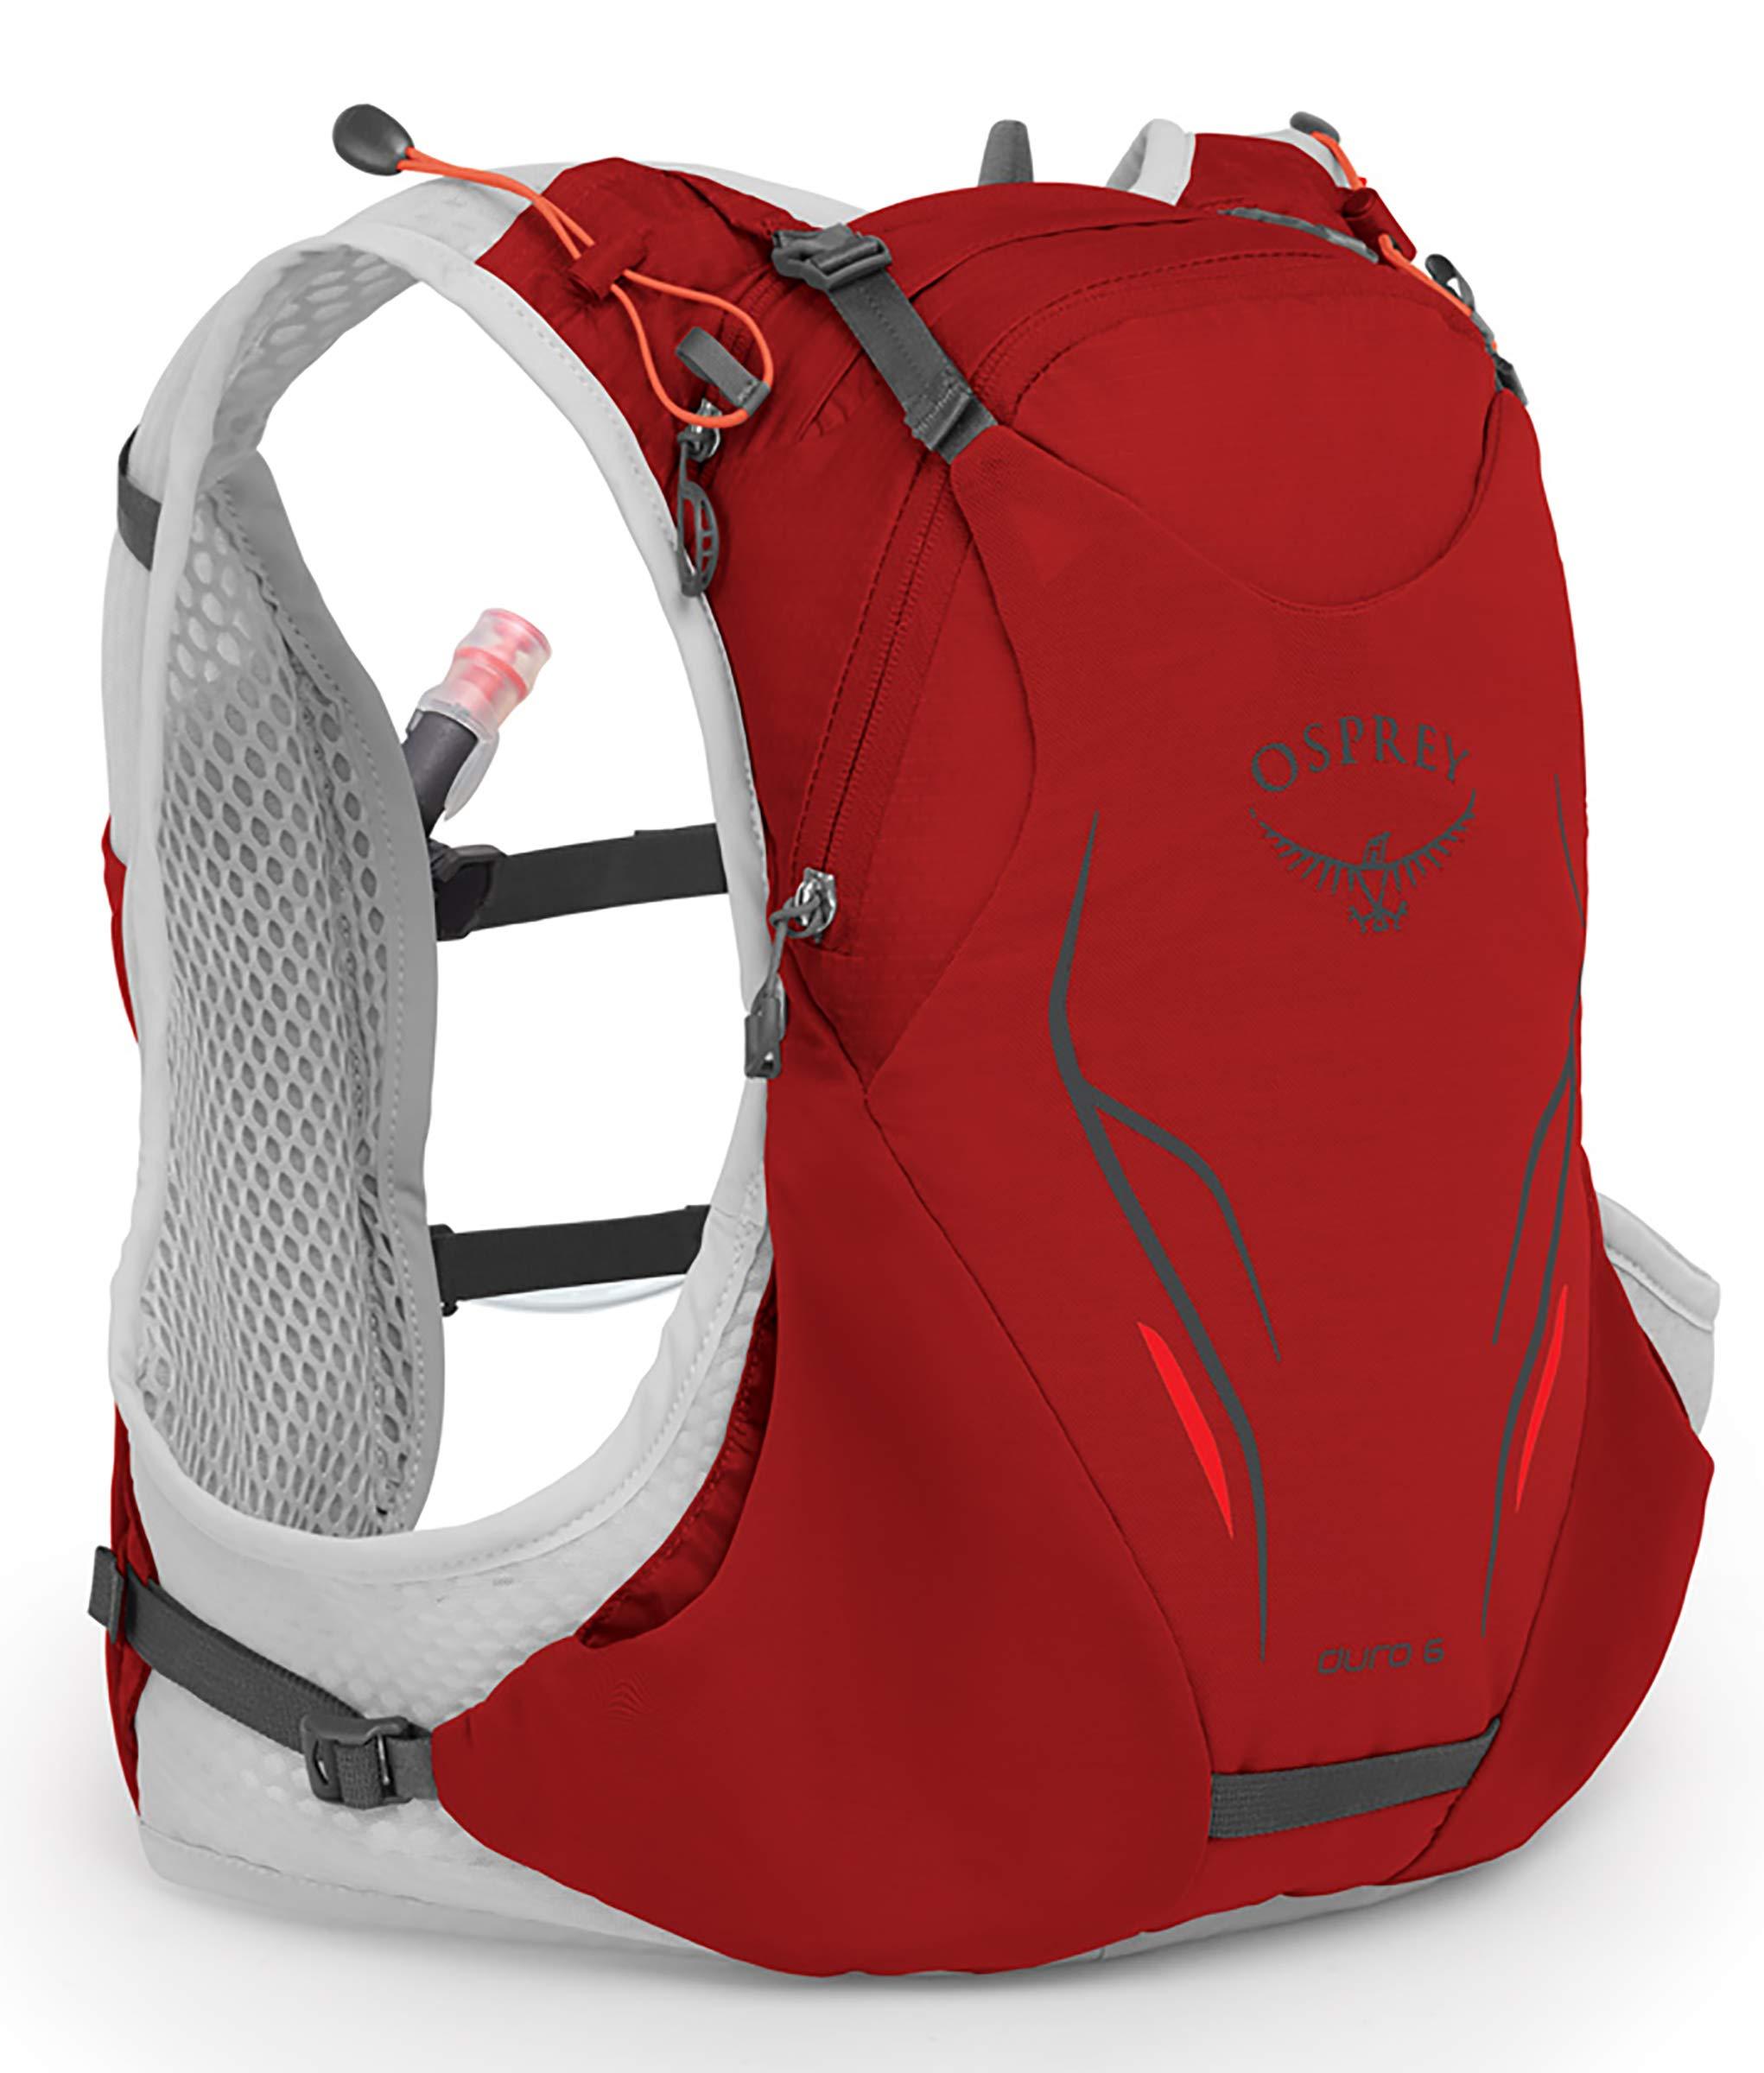 Osprey Packs Duro 6 Running Hydration Vest, Phoenix Red, Small/Medium by Osprey (Image #1)